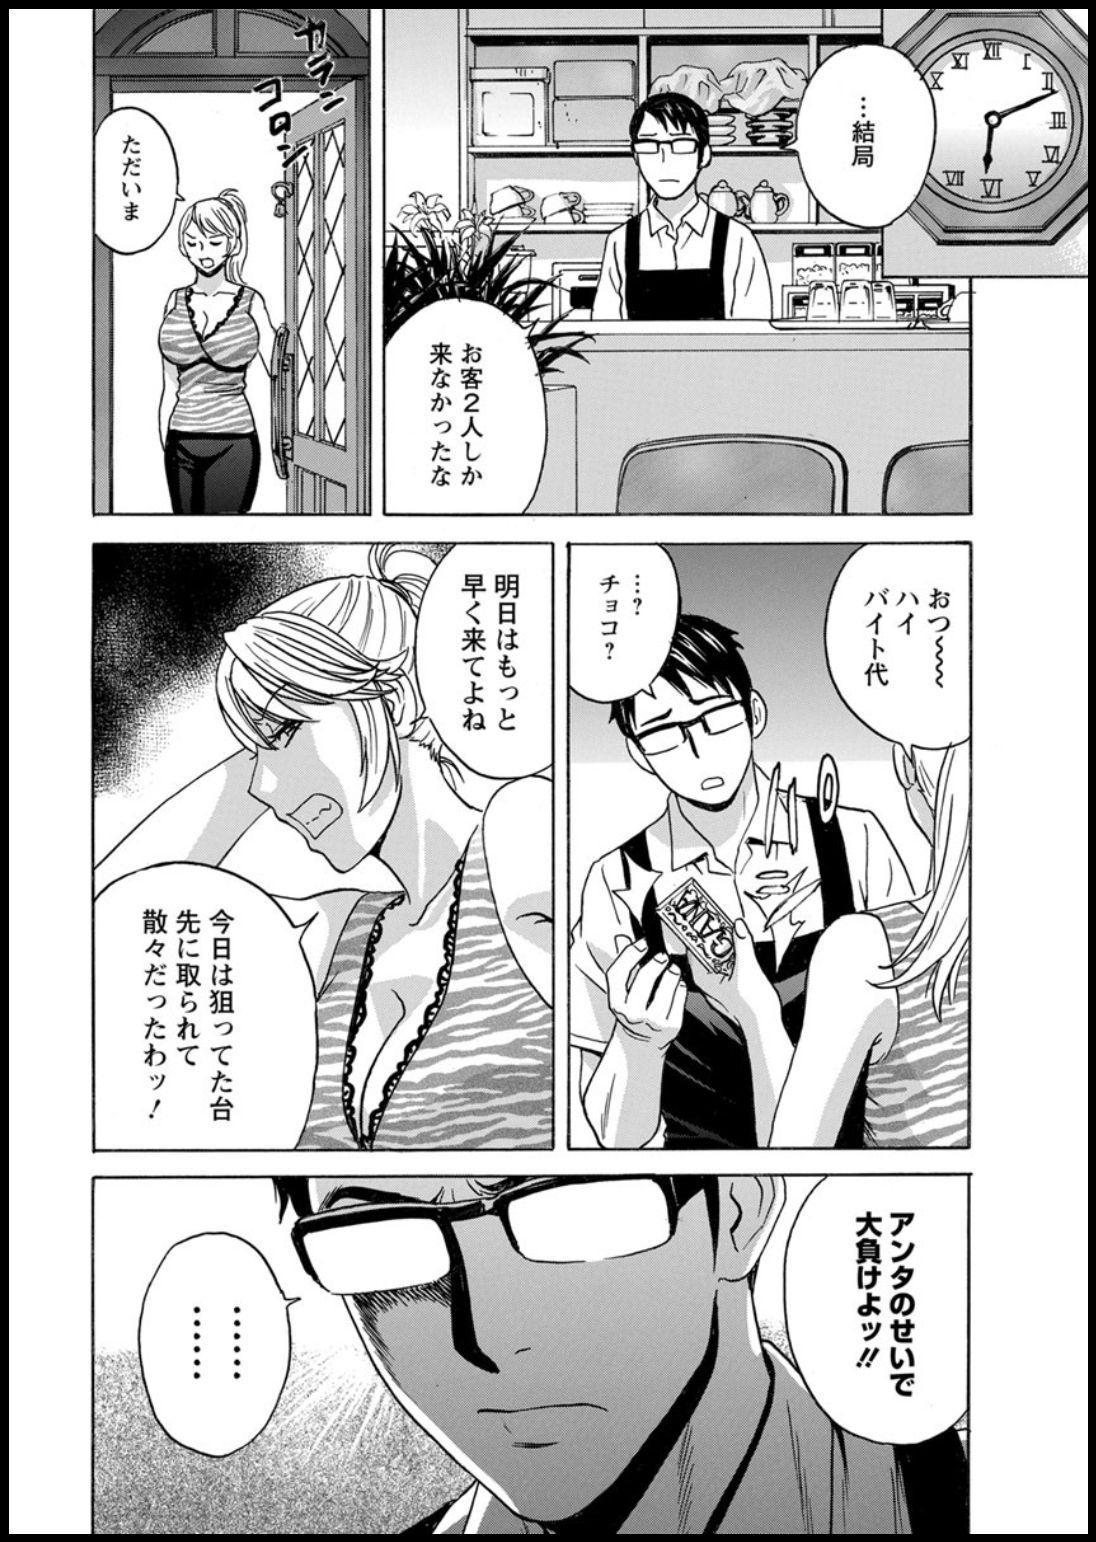 [Hidemaru] Yurase Bikyonyuu! Hataraku J-Cup Ch. 1-5 [Digital] 11